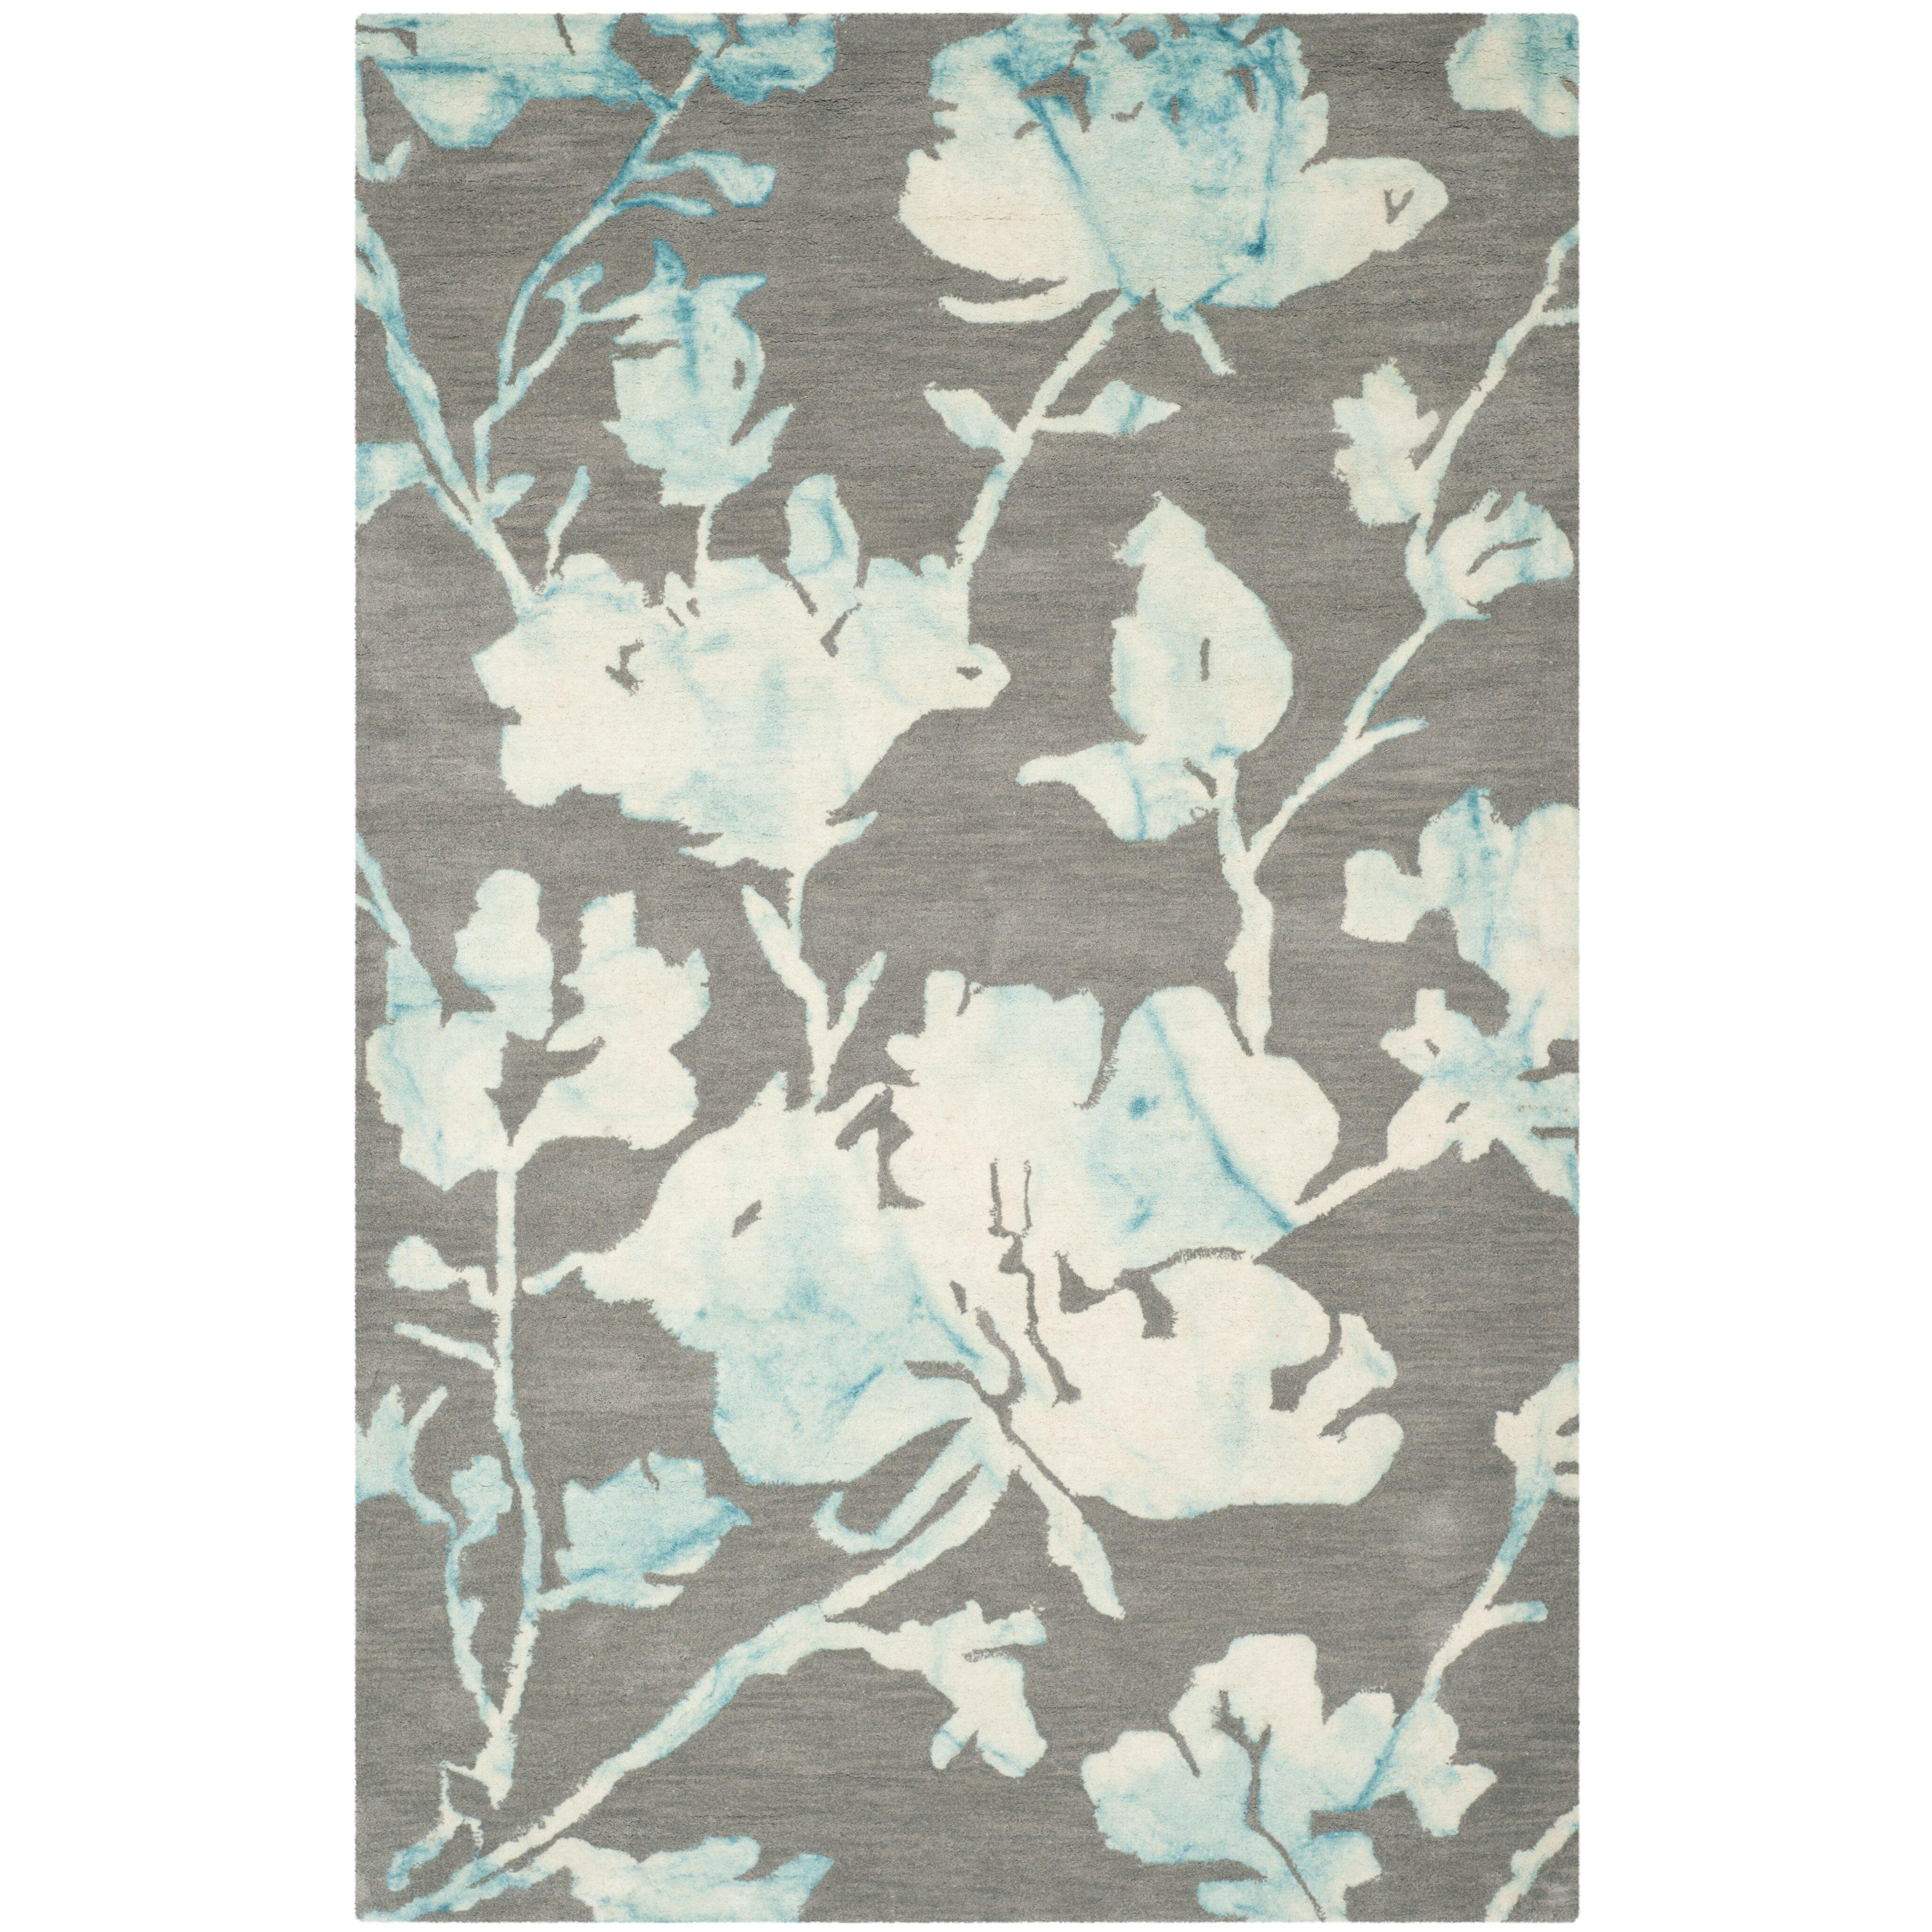 Turquoise Area Rug Amazon Com: Safavieh Dip Dye Gray/Turquoise Area Rug & Reviews